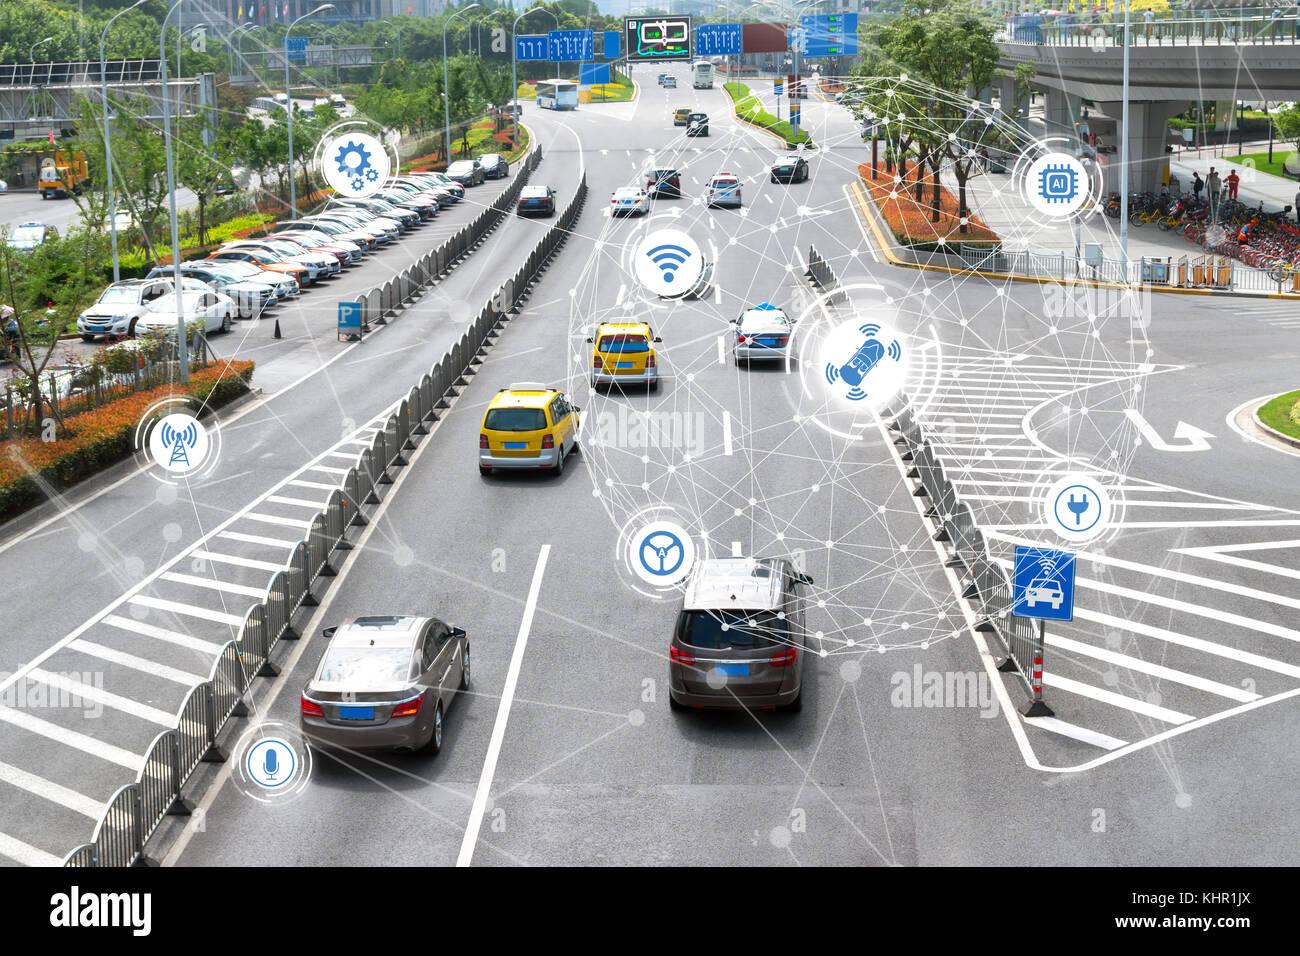 Smart car , Autonomous self-driving mode vehicle on metro city road iot concept with graphic sensor radar signal - Stock Image